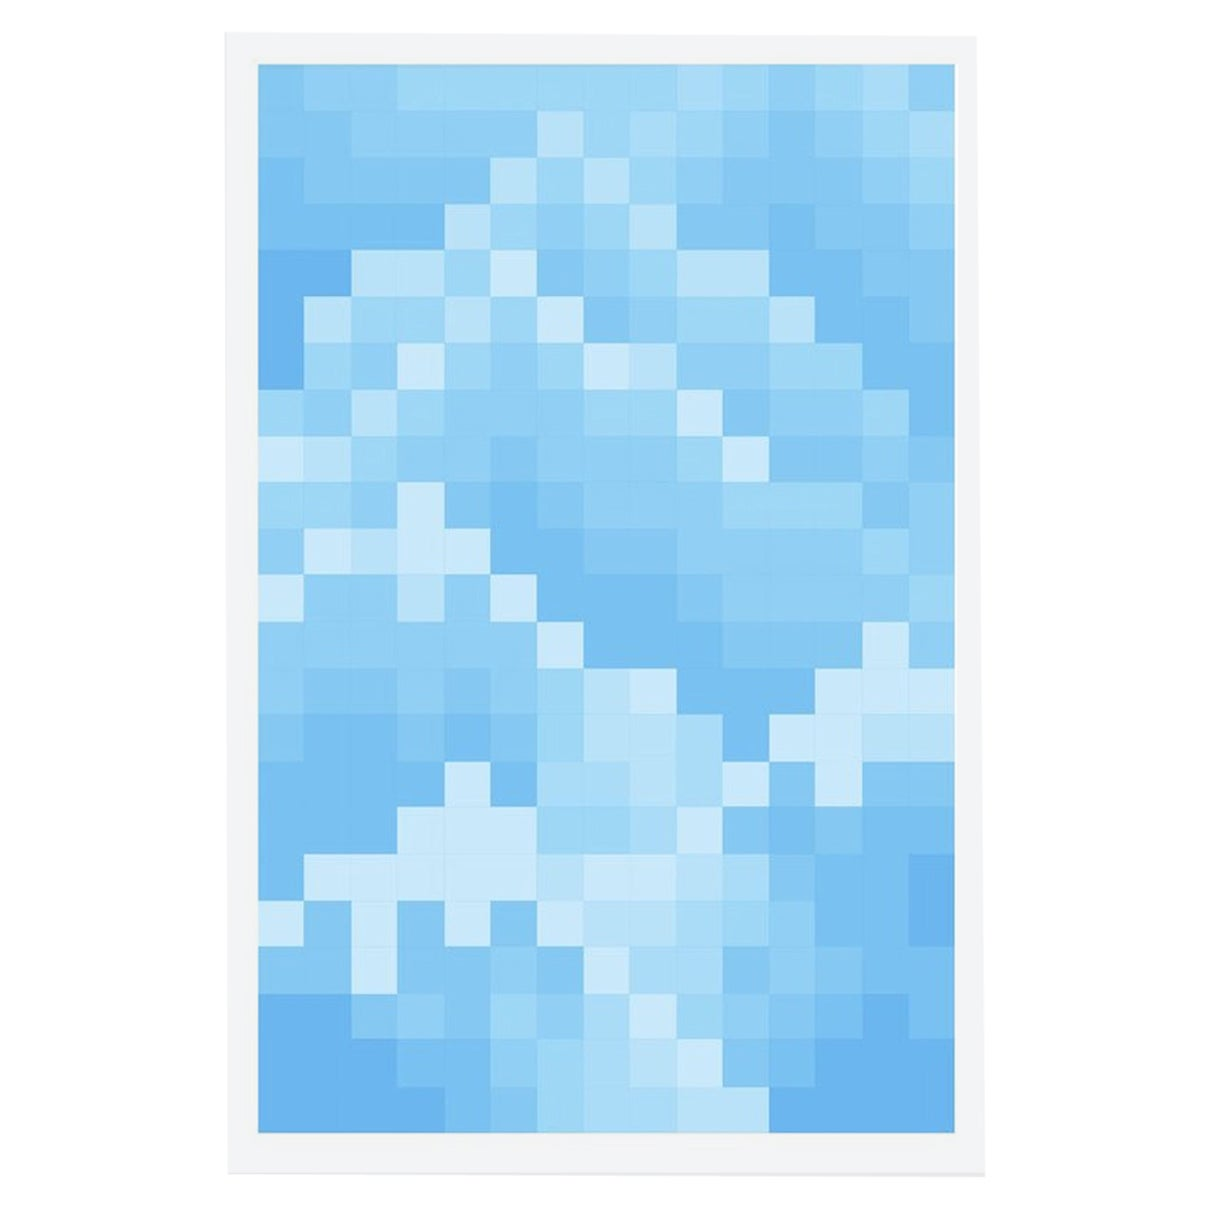 Bruce High Quality Foundation Mosaic Mountain Print Cyan Print